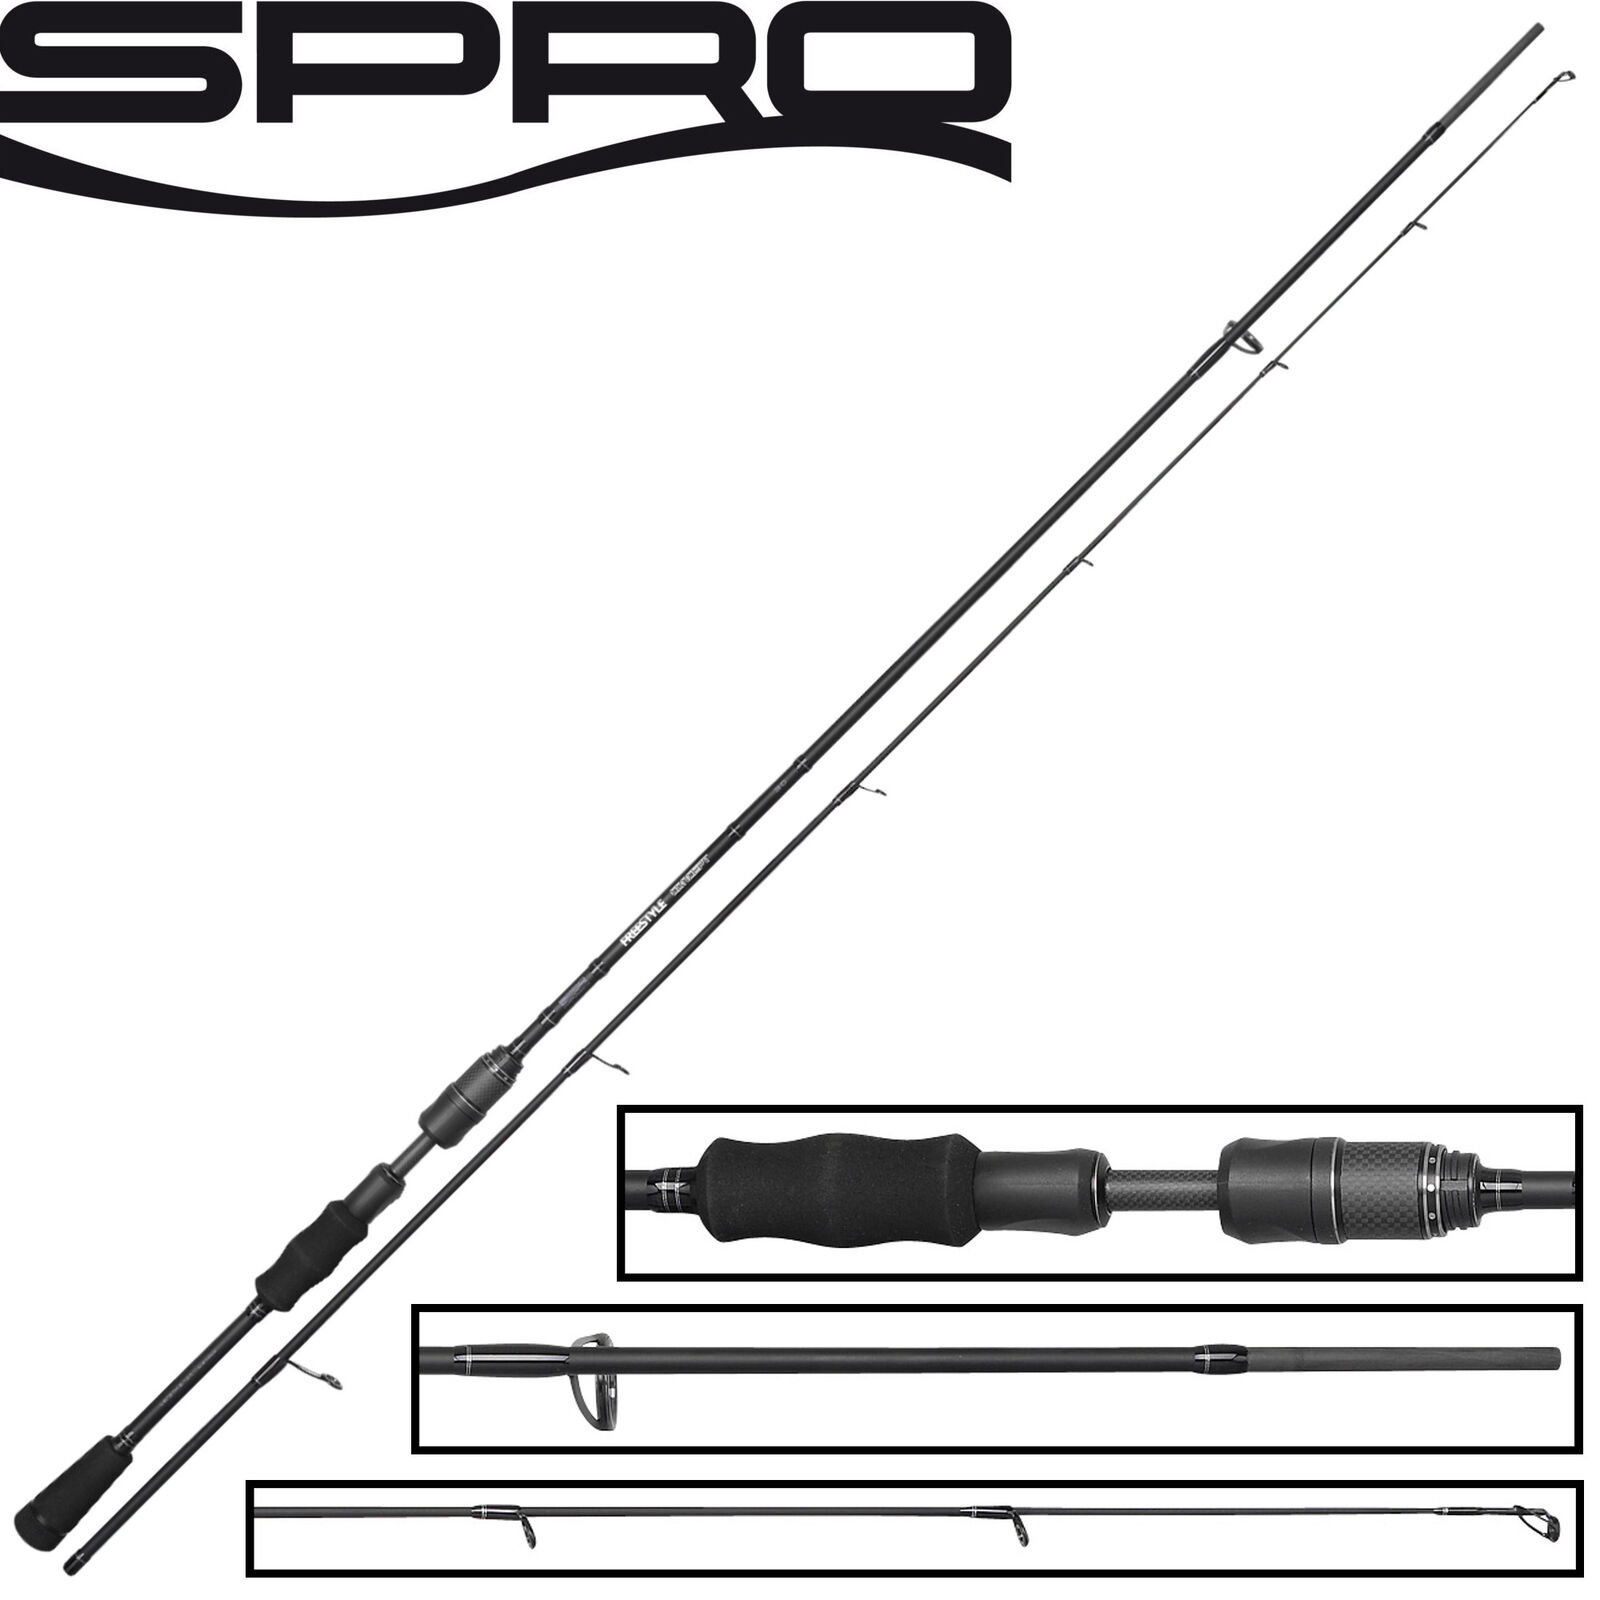 Spro Freestyle Concept Jig Spin 30 2,40m 5-20g - Spinnrute, Barschrute, Jigrute